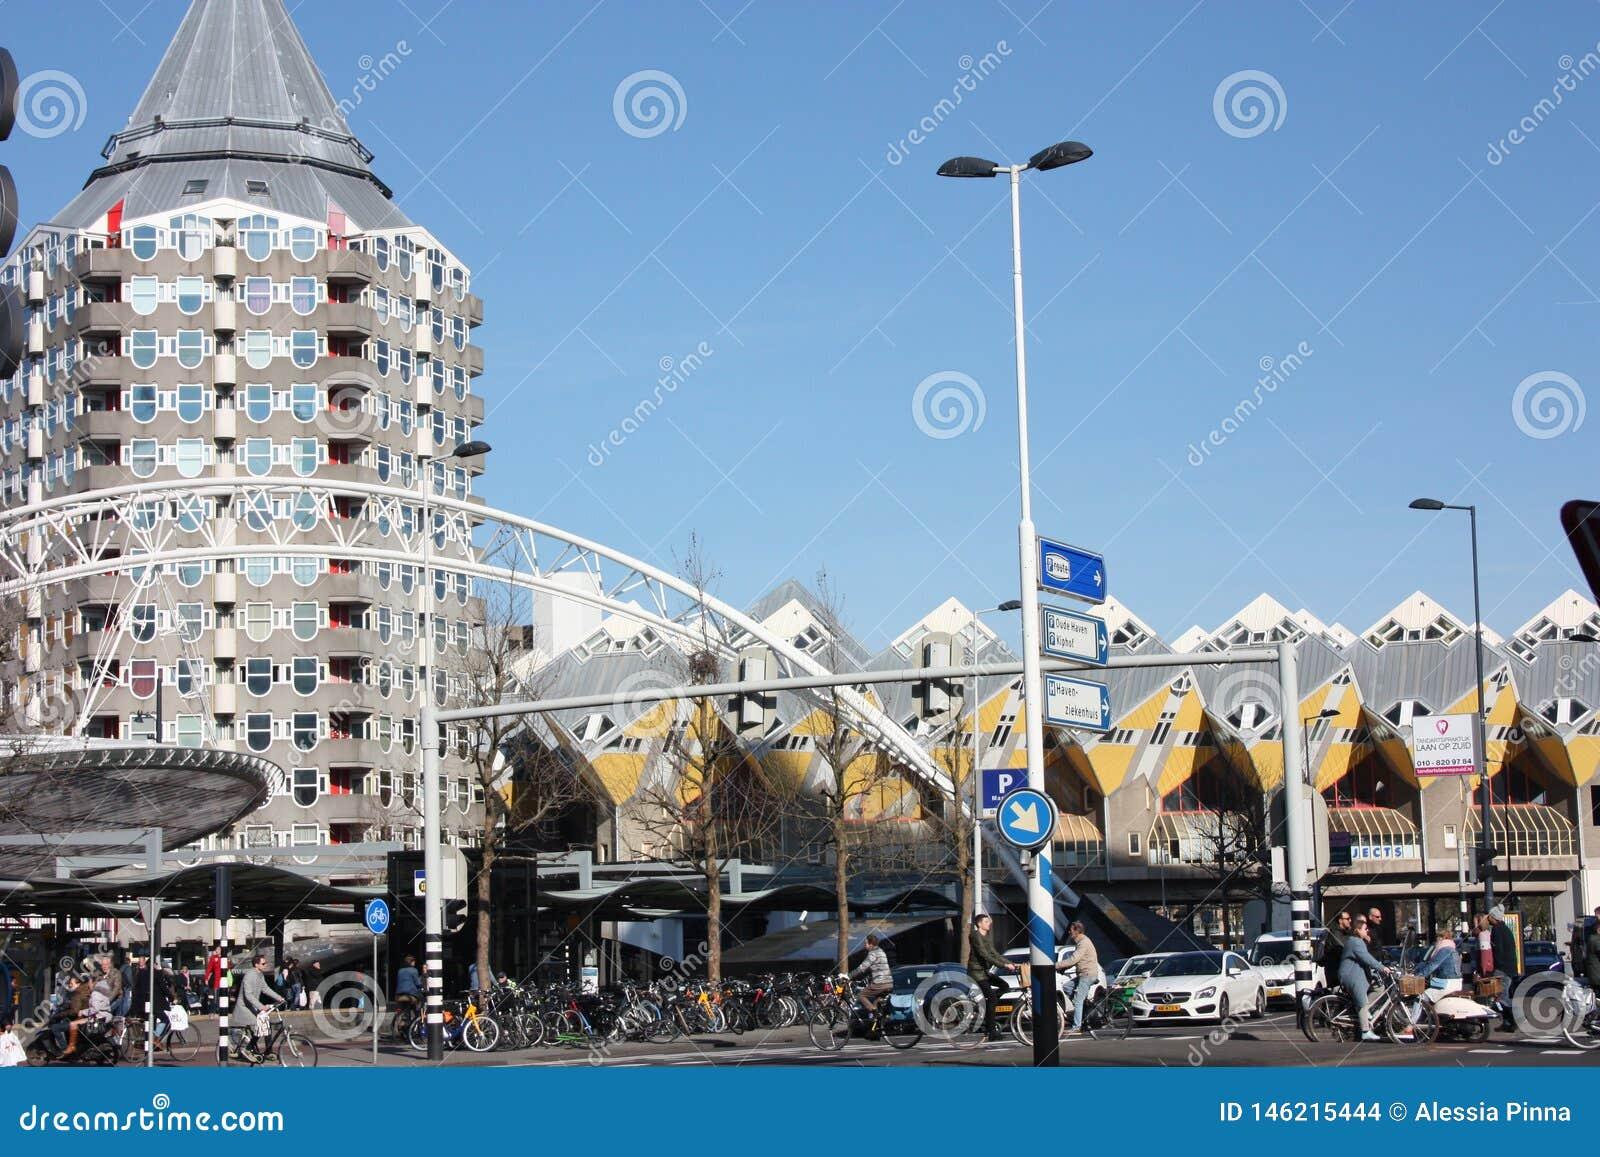 Caos di?rio da cidade na esta??o h?tica e moderna da metr?pole de Rotterdam As casas c?bicas amarelas s?o a decora??o do